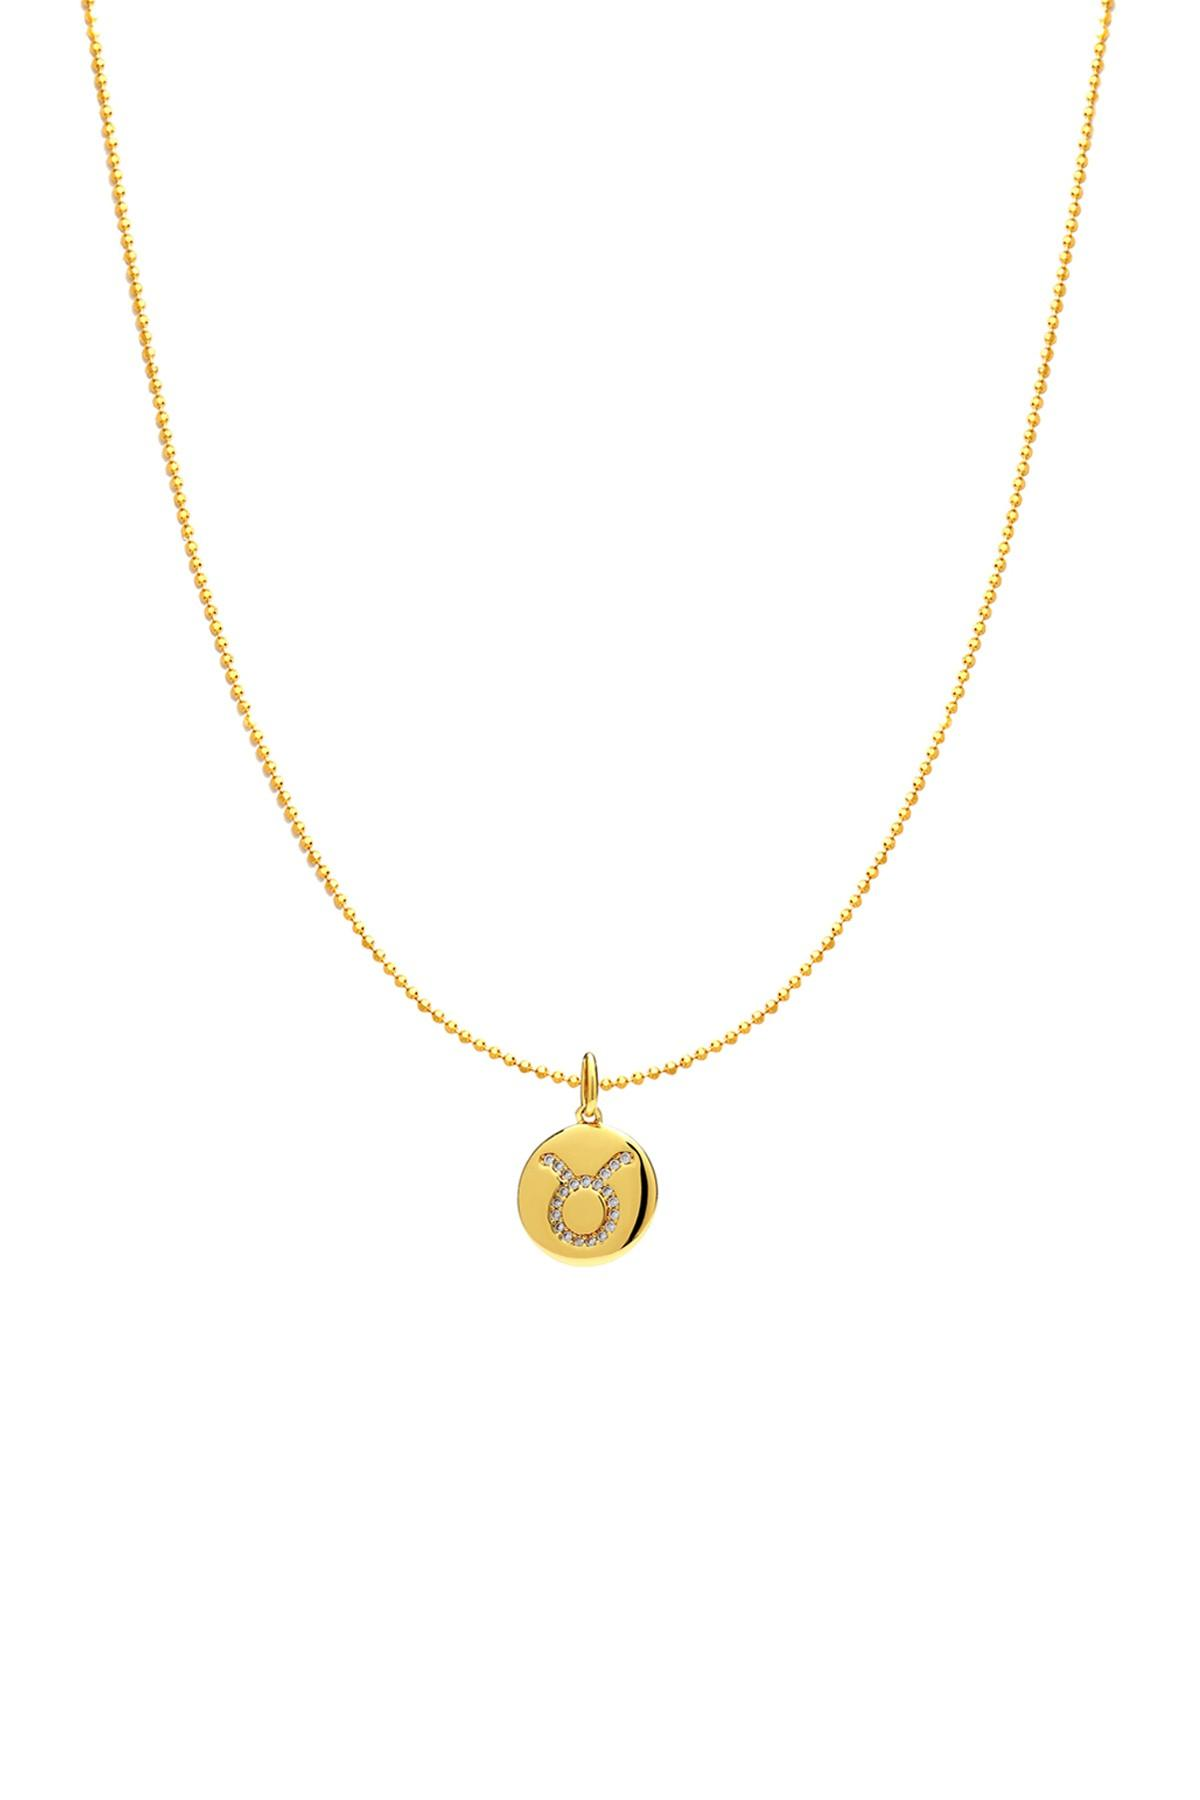 420249af9 Lyst - Nadri 18k Gold Plated Taurus Zodiac Charm Necklace in Metallic